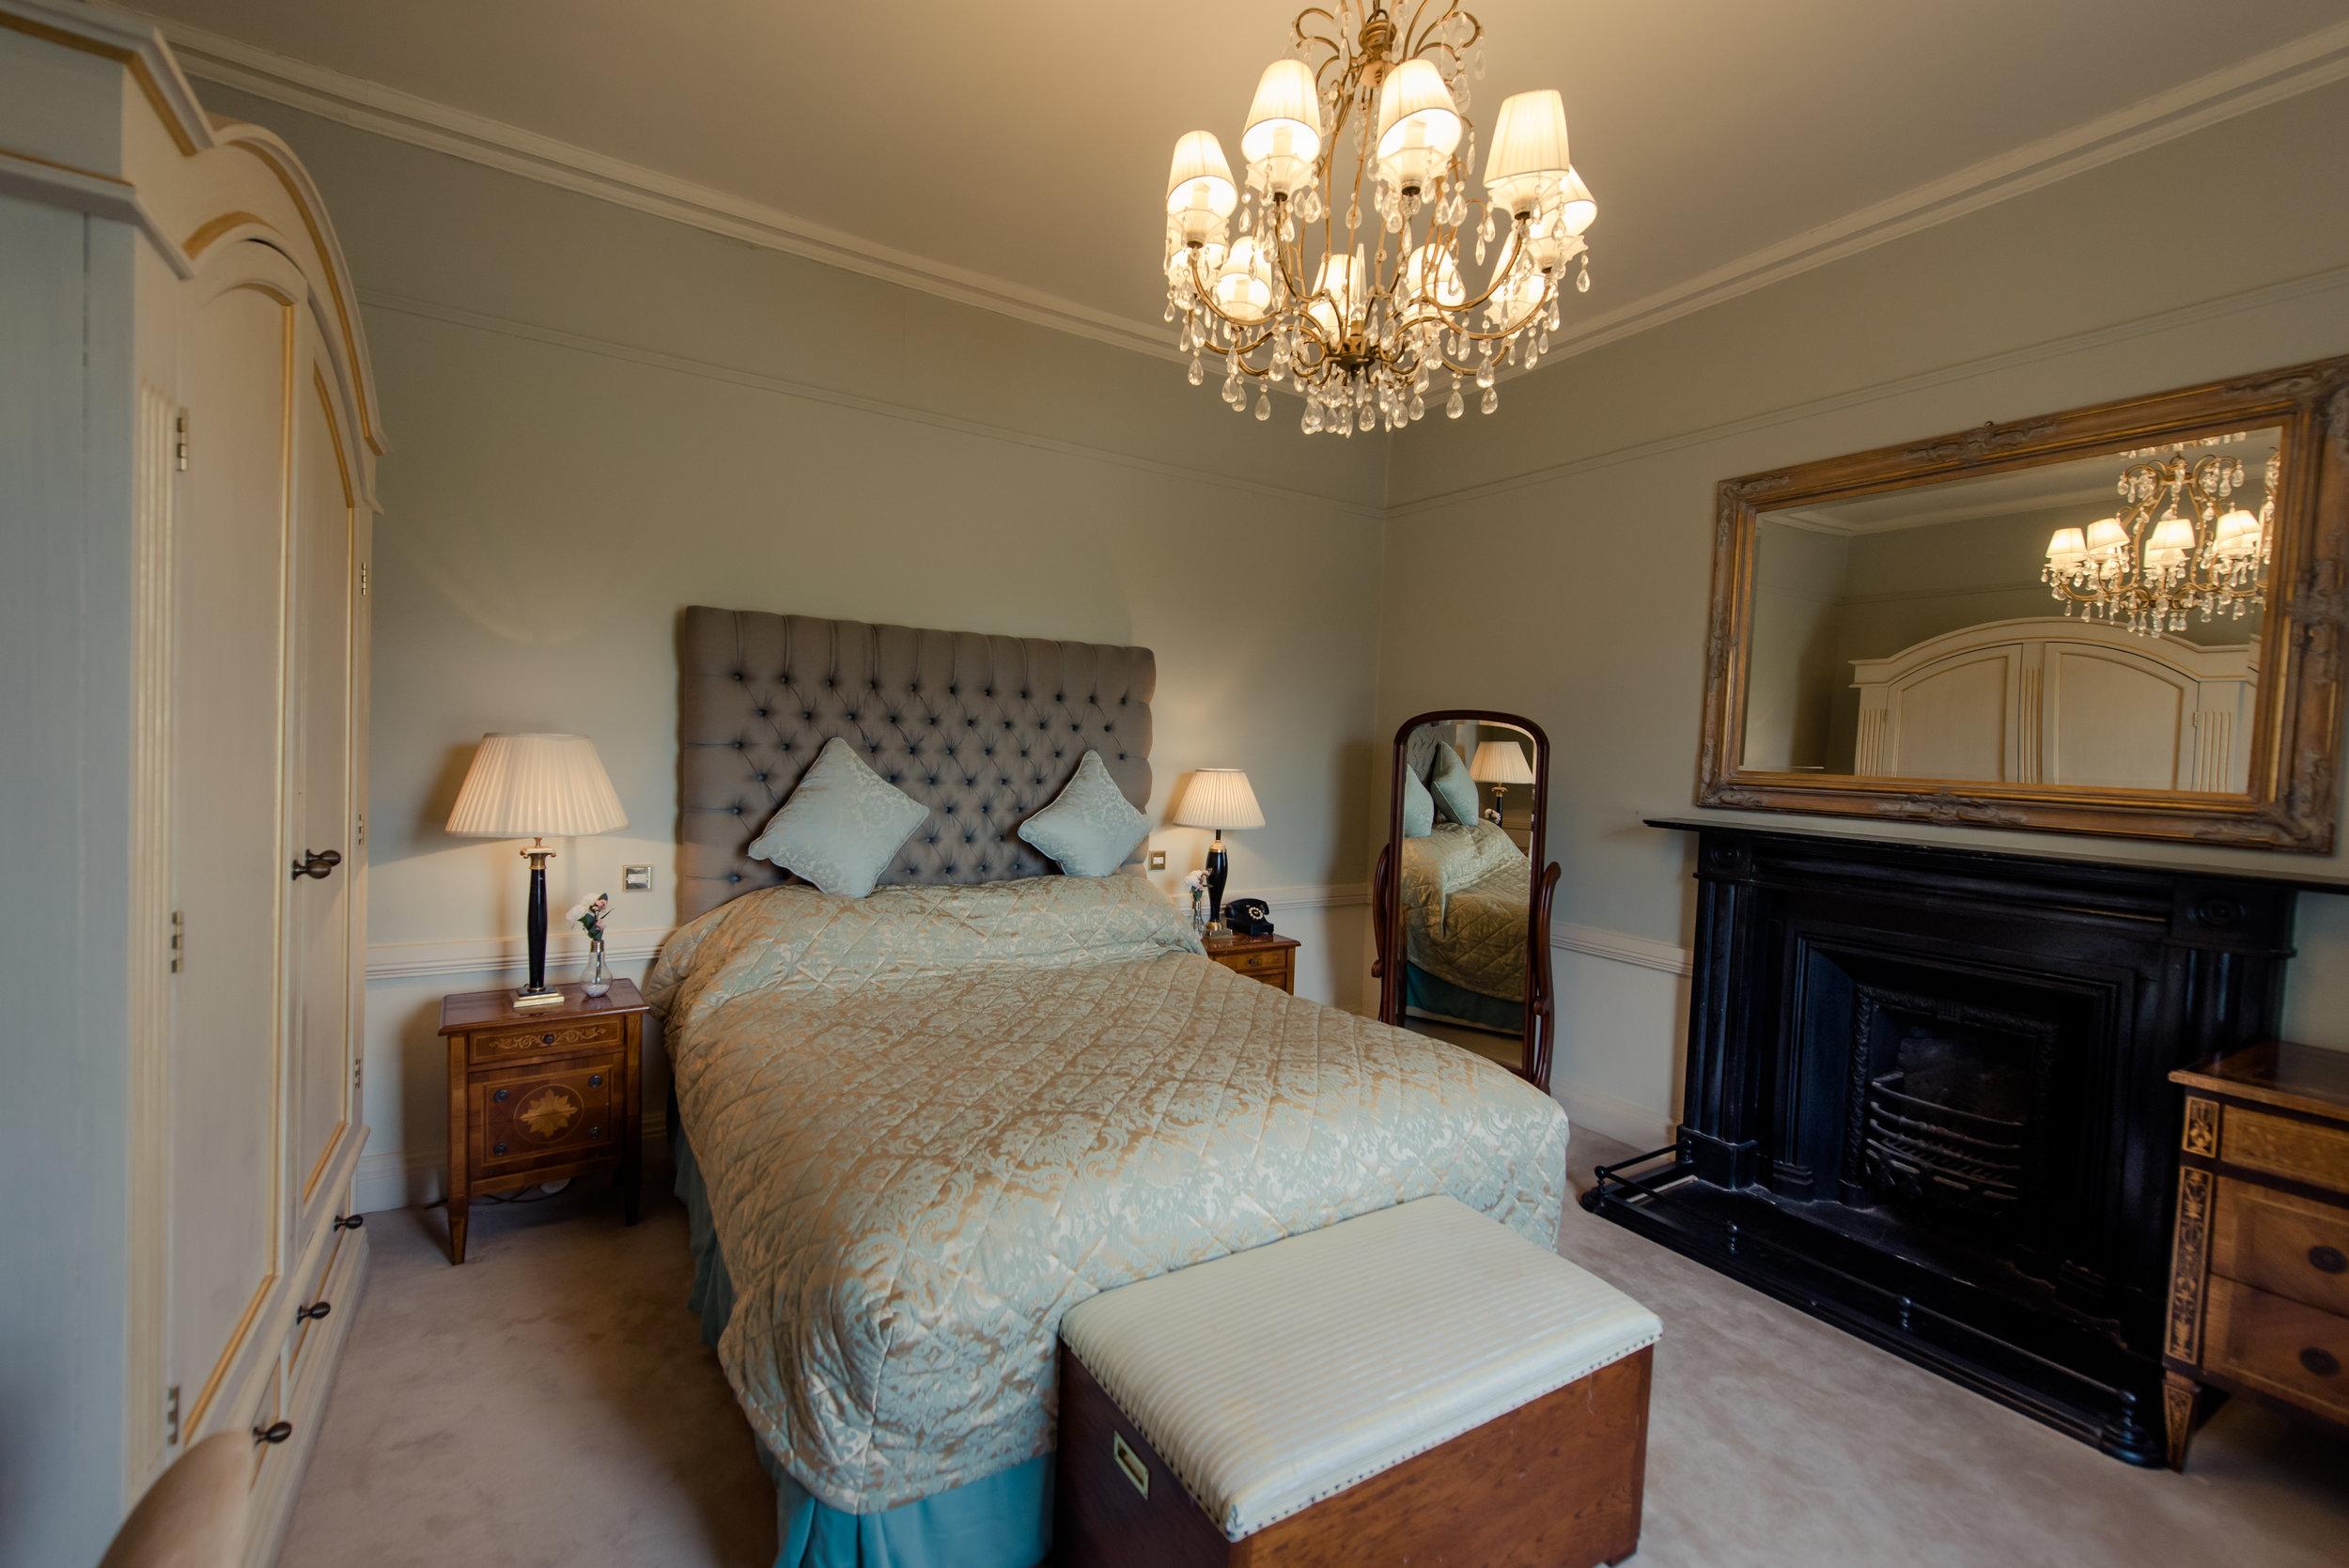 Tulfarris Hotel & Golf Resort Manor House bedroom with light blue setting.jpg